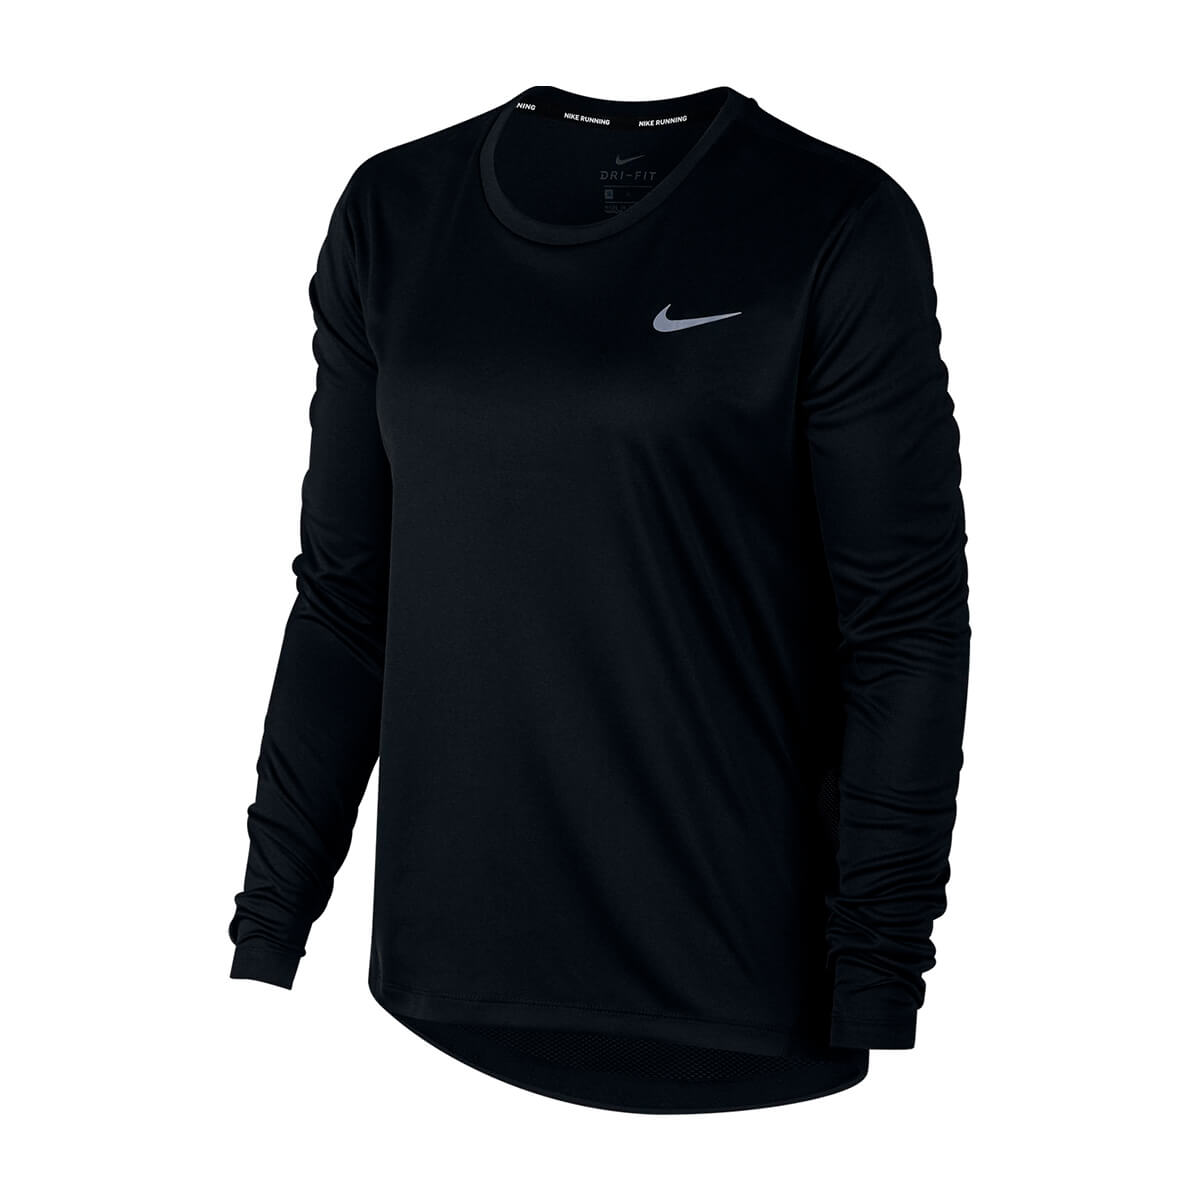 Camisa Nike Manga Longa Dry Miller Top Preto